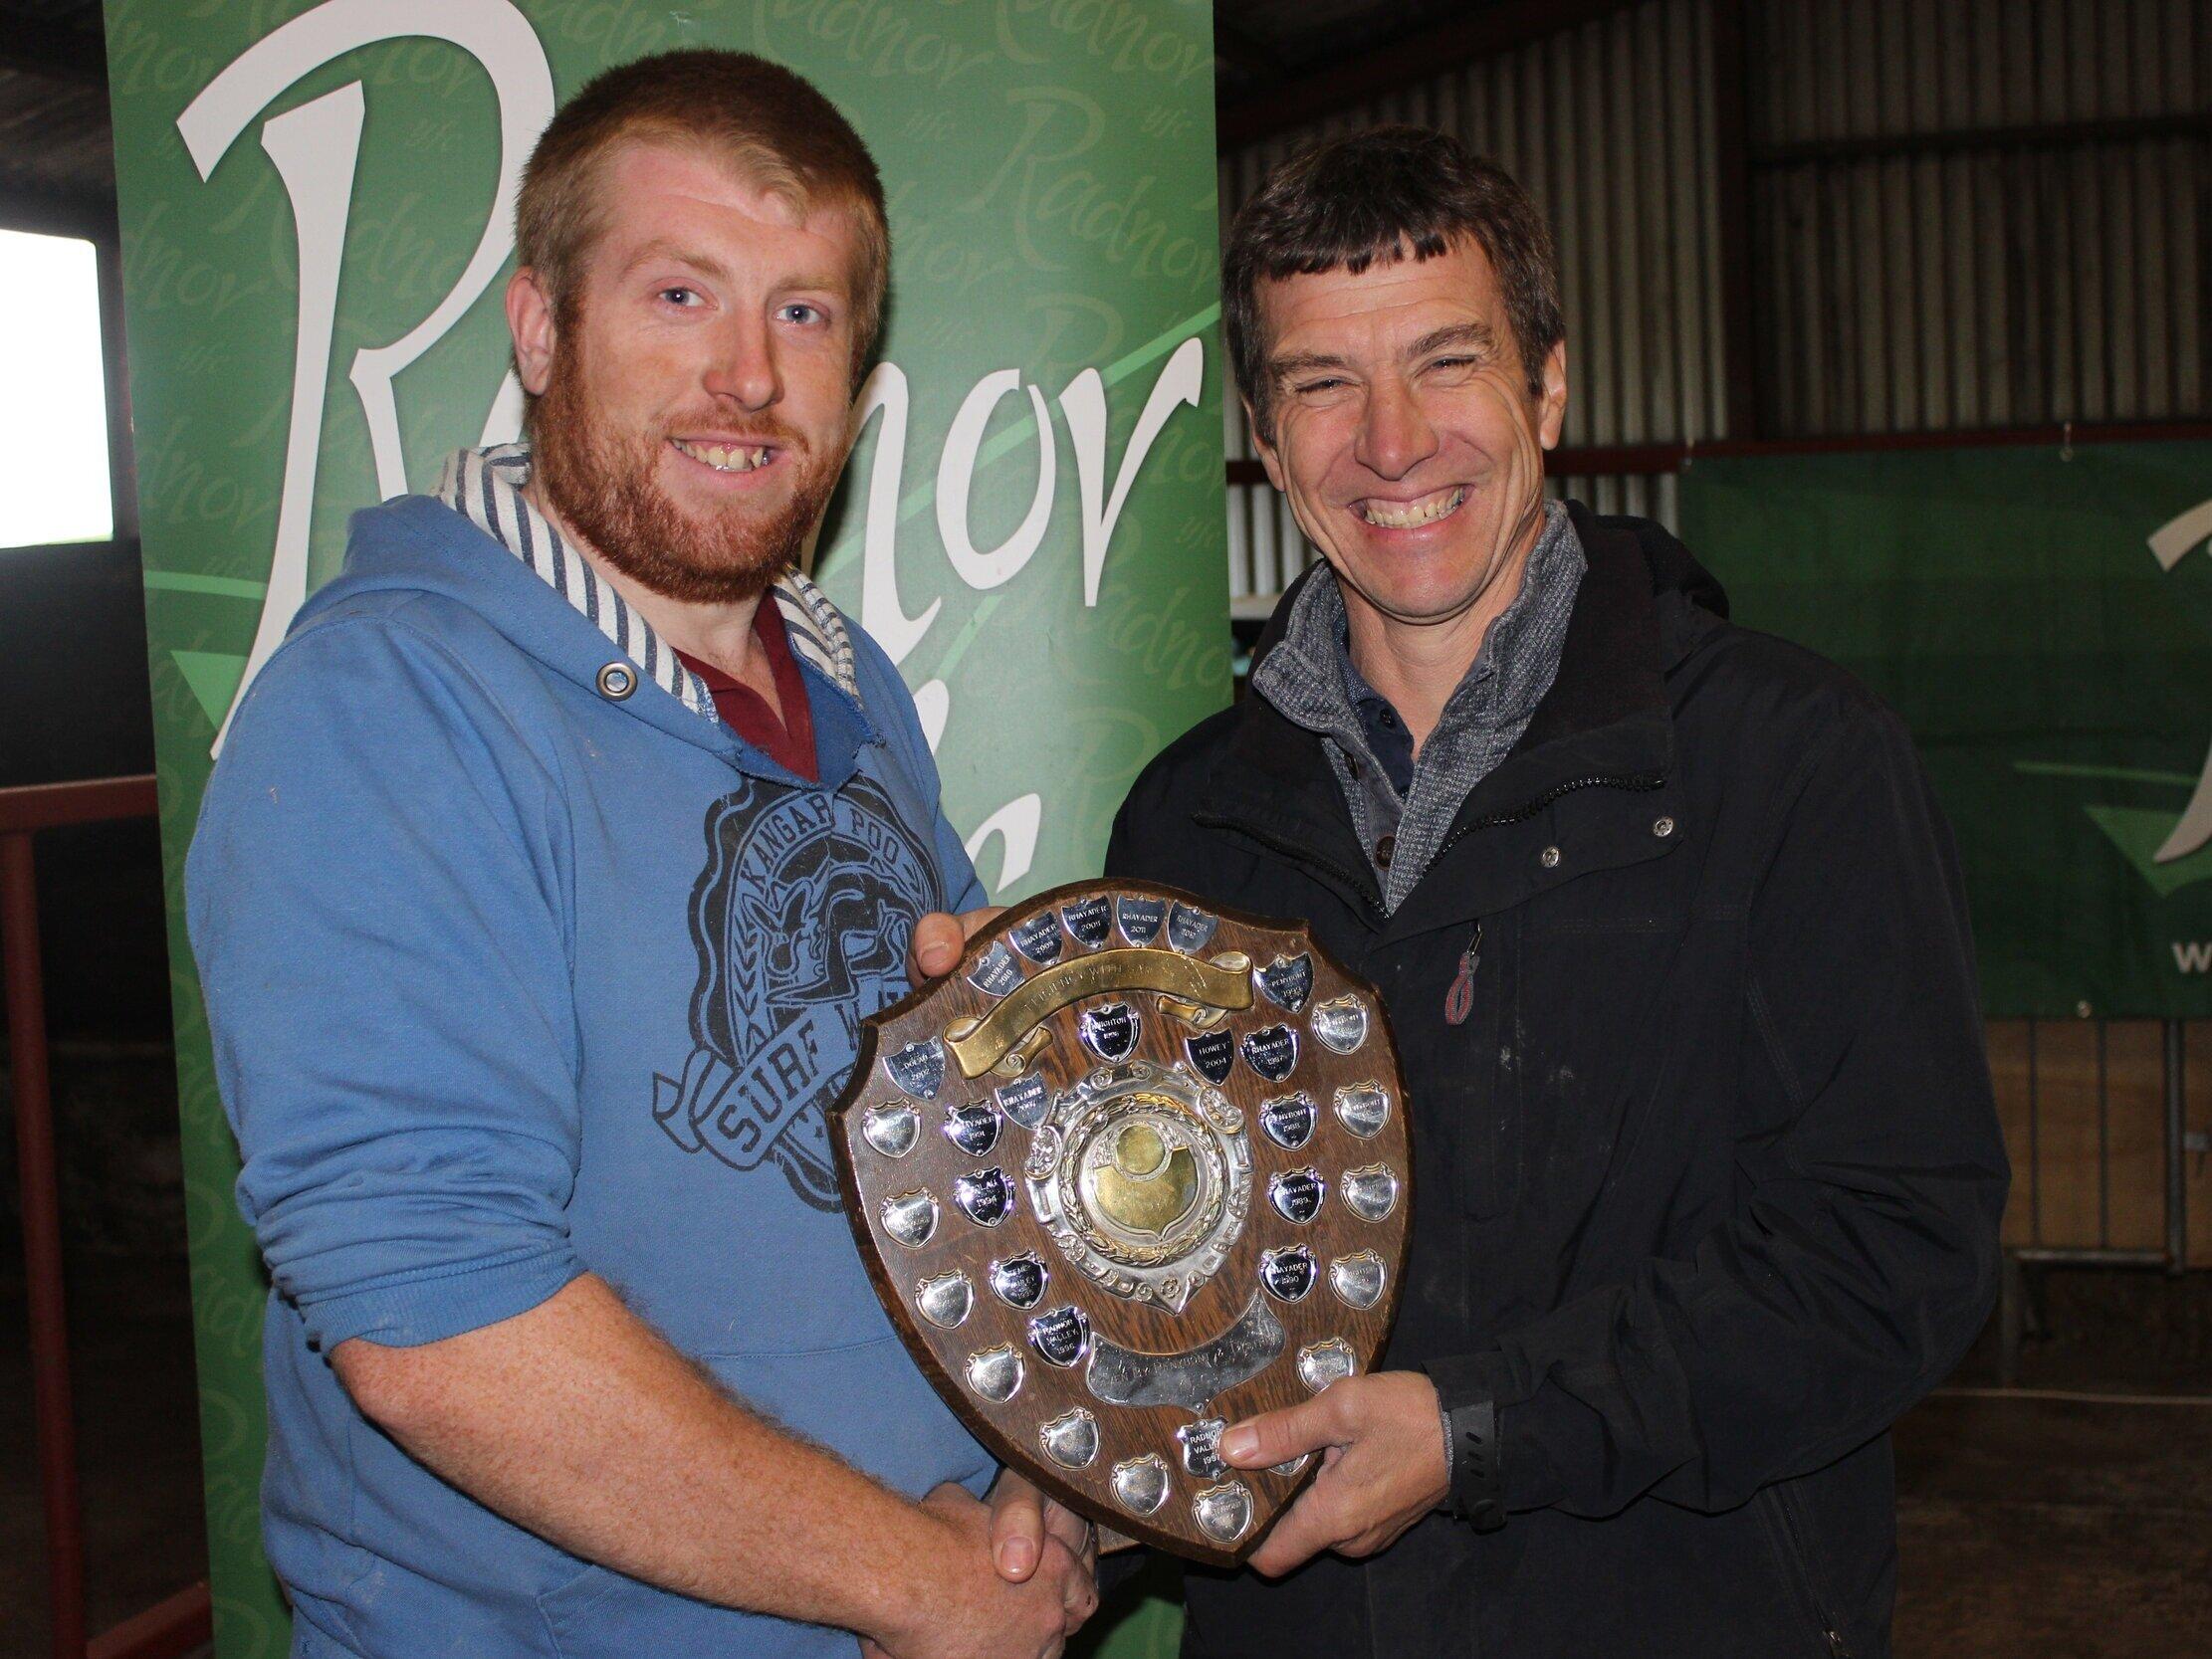 John James, Howey YFC - Penybont YFC Shield for Farm Safety Skills with Host, Mark Watson